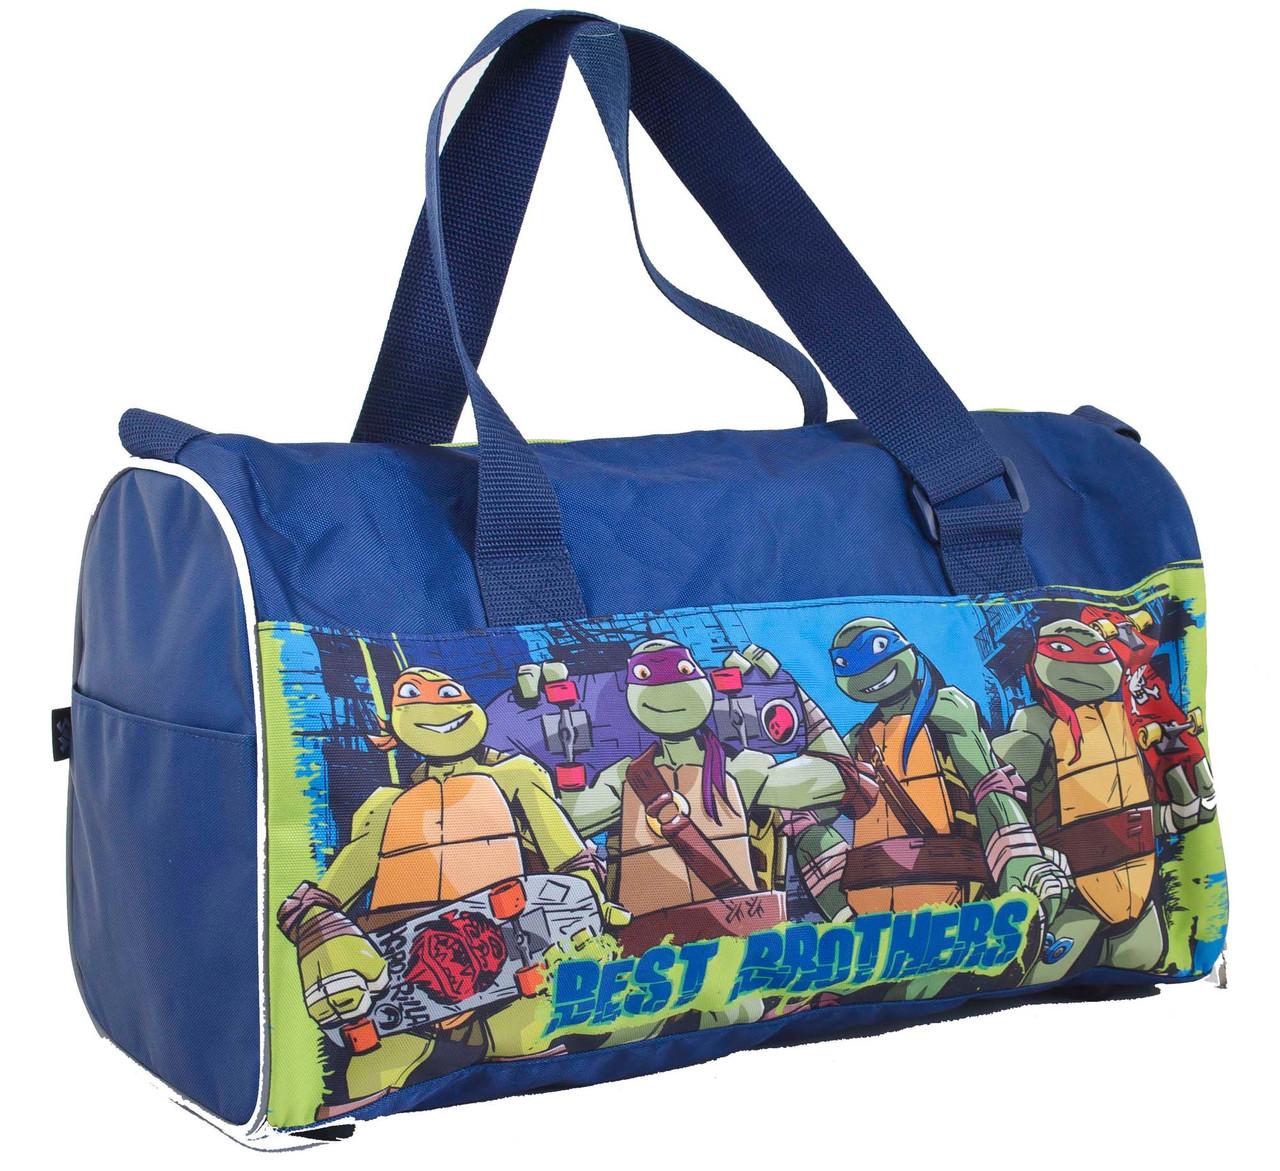 ca2cdf7239bc Сумка спортивная детская BS-16 Turtles 553901 1 Вересня, цена 276,43 грн.,  купить в Чернигове — Prom.ua (ID#517551208)